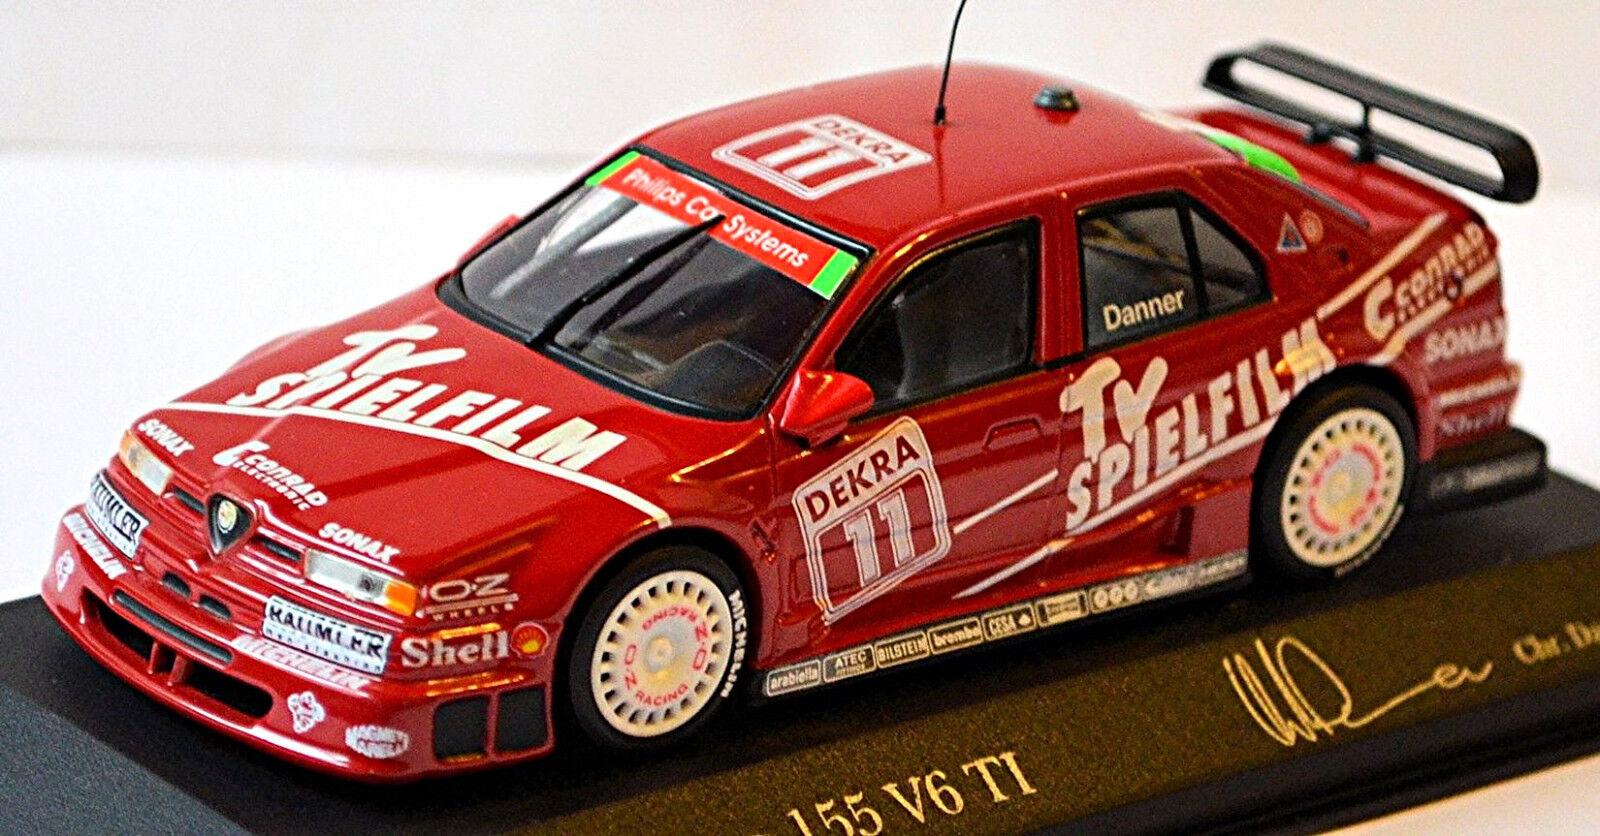 Alfa Romeo 155 V6 TI DTM 1994 Danner TV Spielfilm 1 43 Minichamps